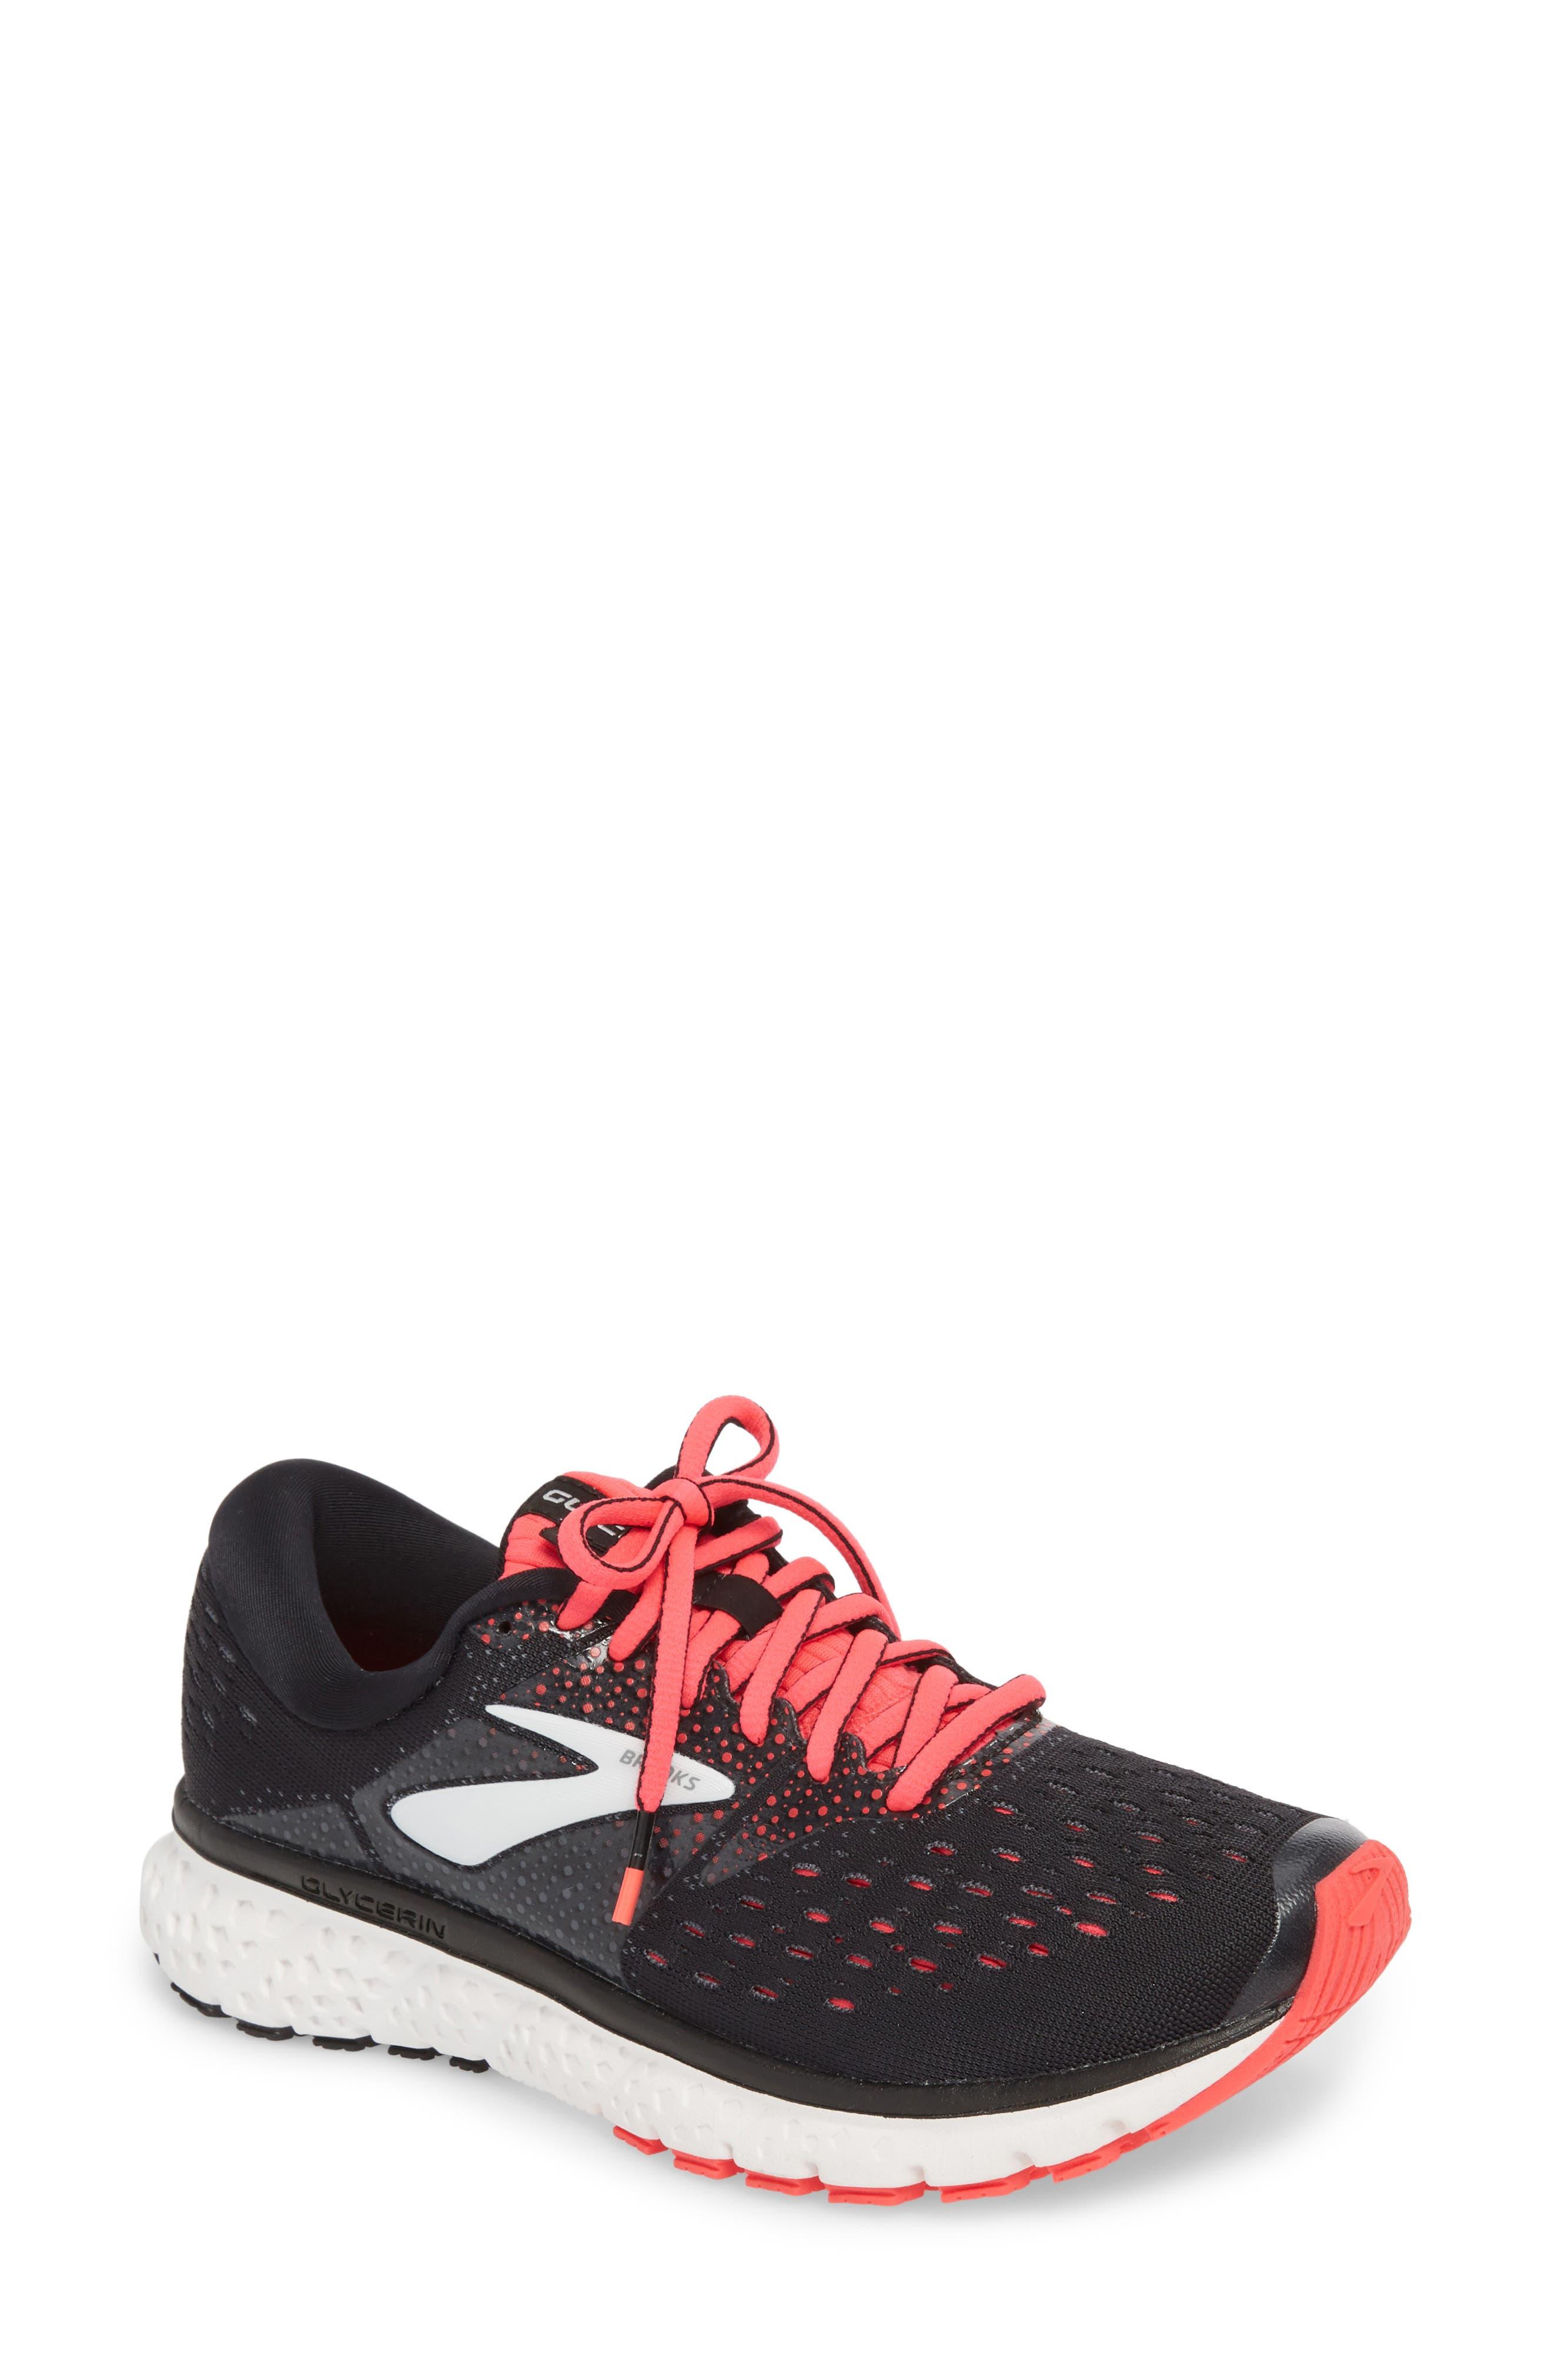 Glycerin 16 Running Shoe,                         Main,                         color, BLACK/ PINK/ GREY